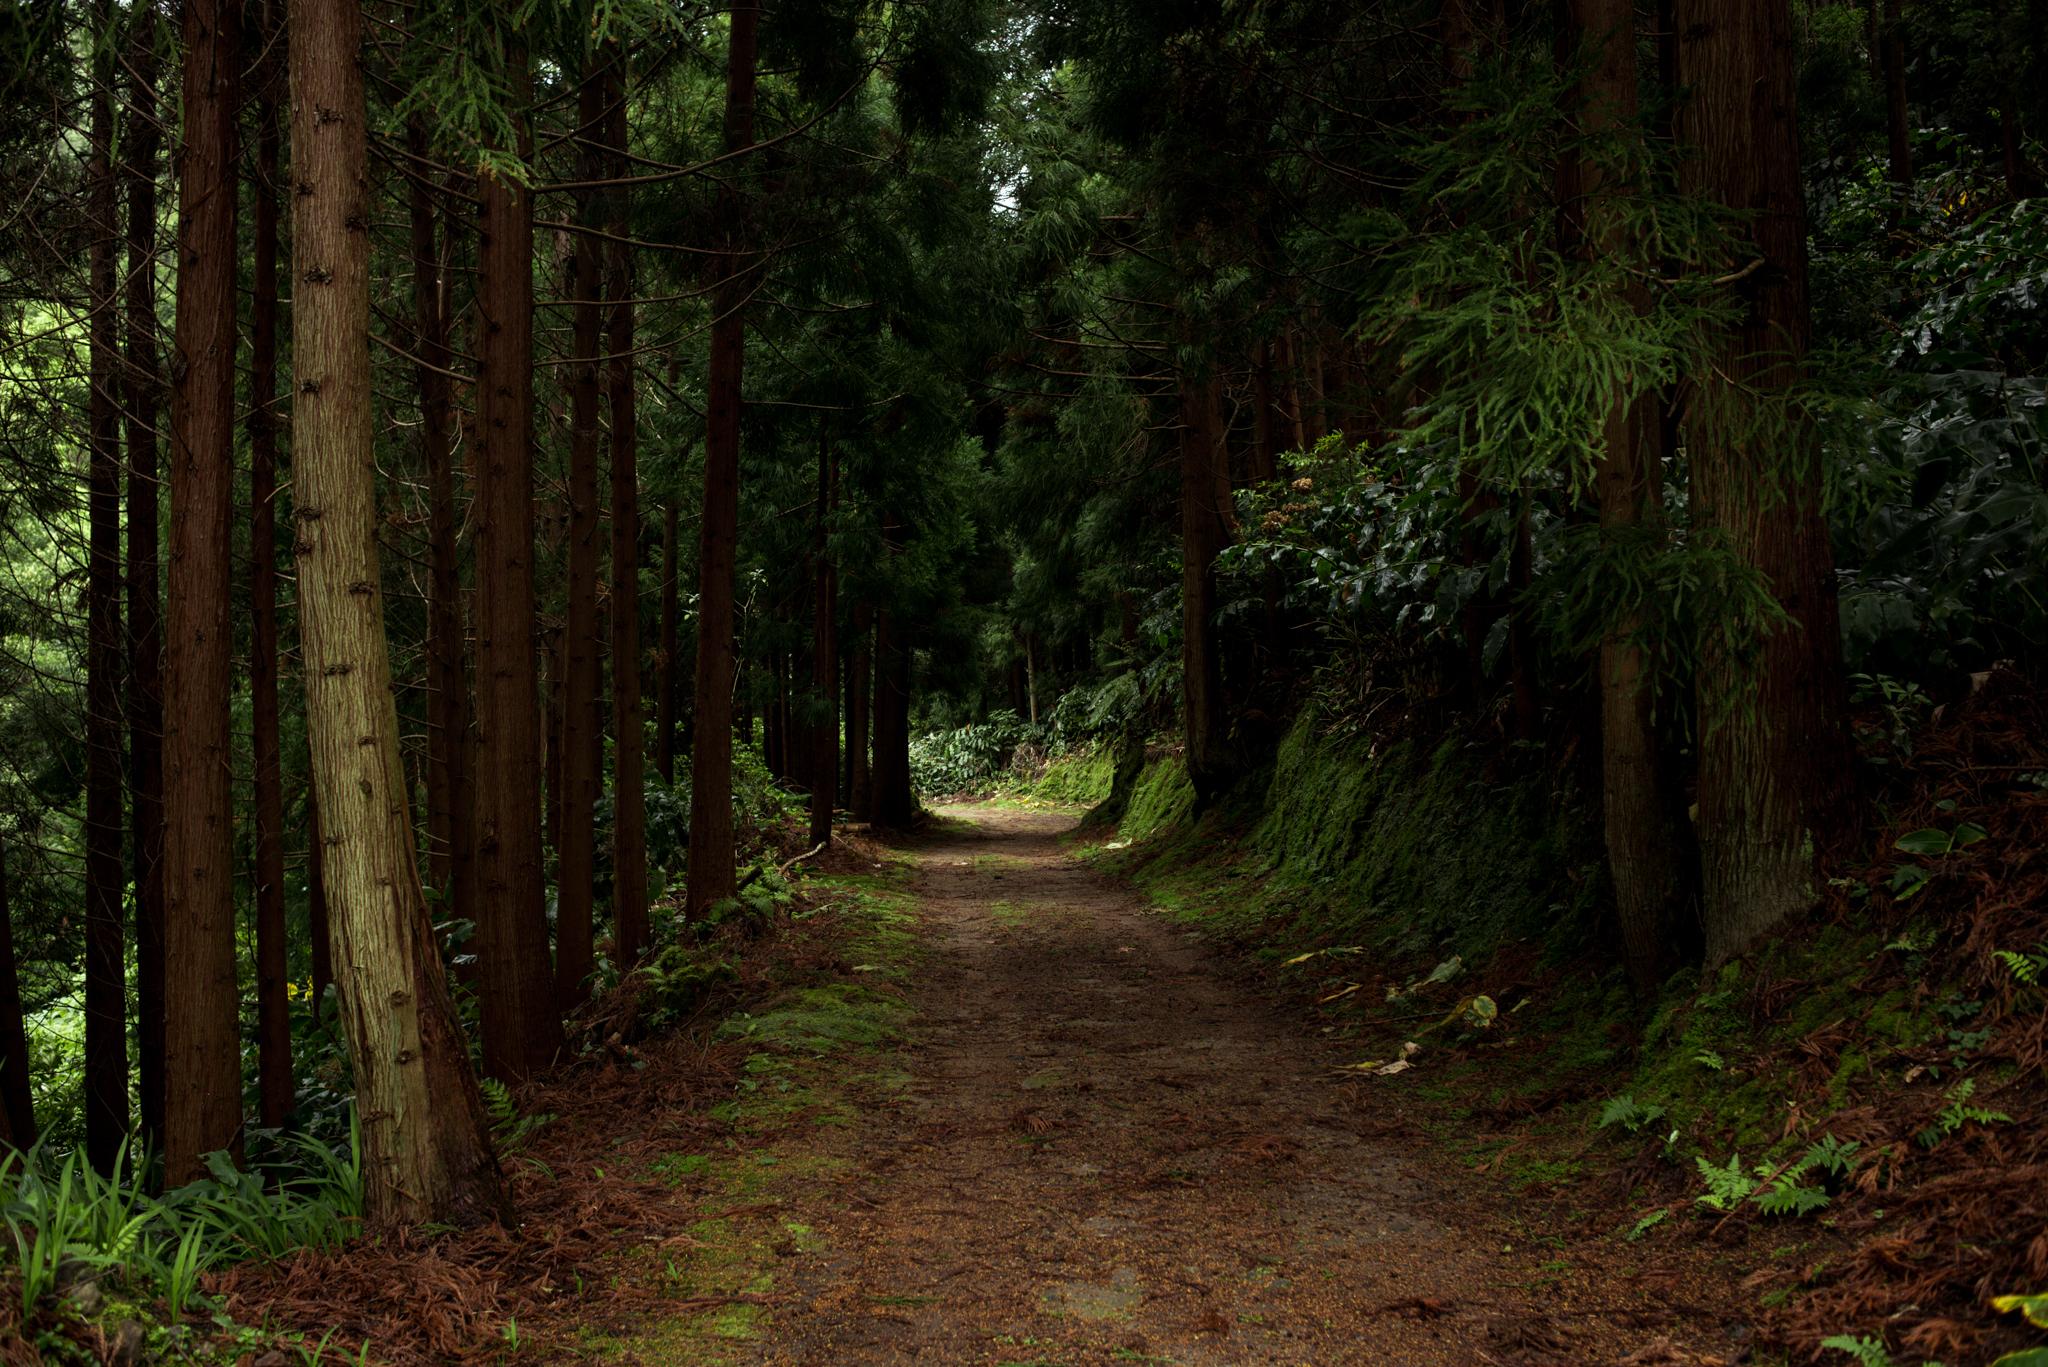 Azori-szigetiki fenyőerdő